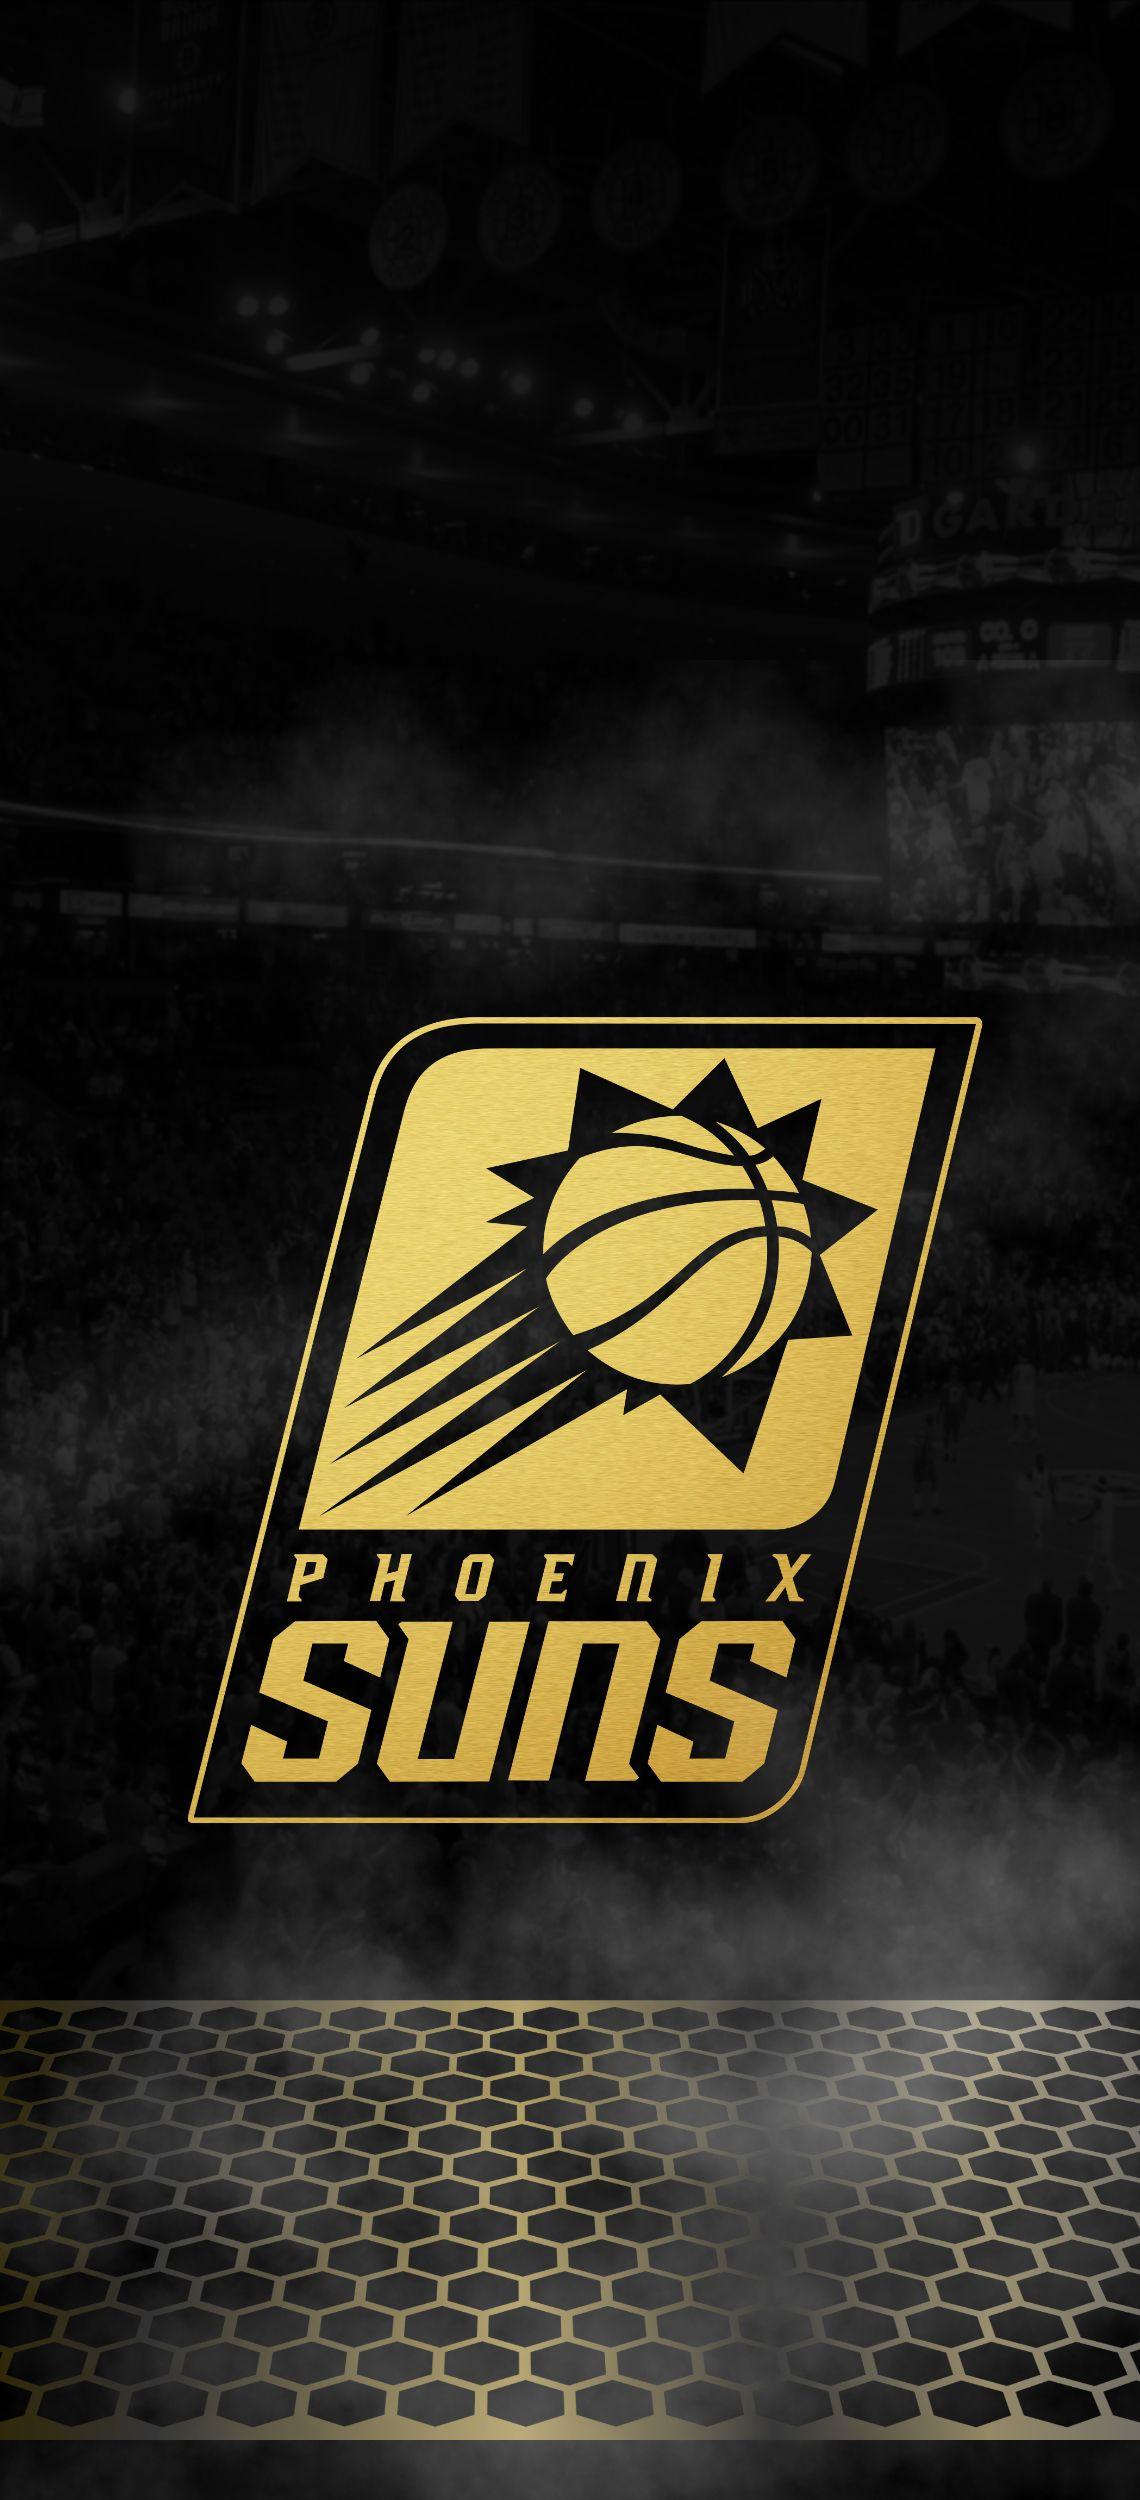 Phoenix Suns Iphone Wallpapers - Wallpaper